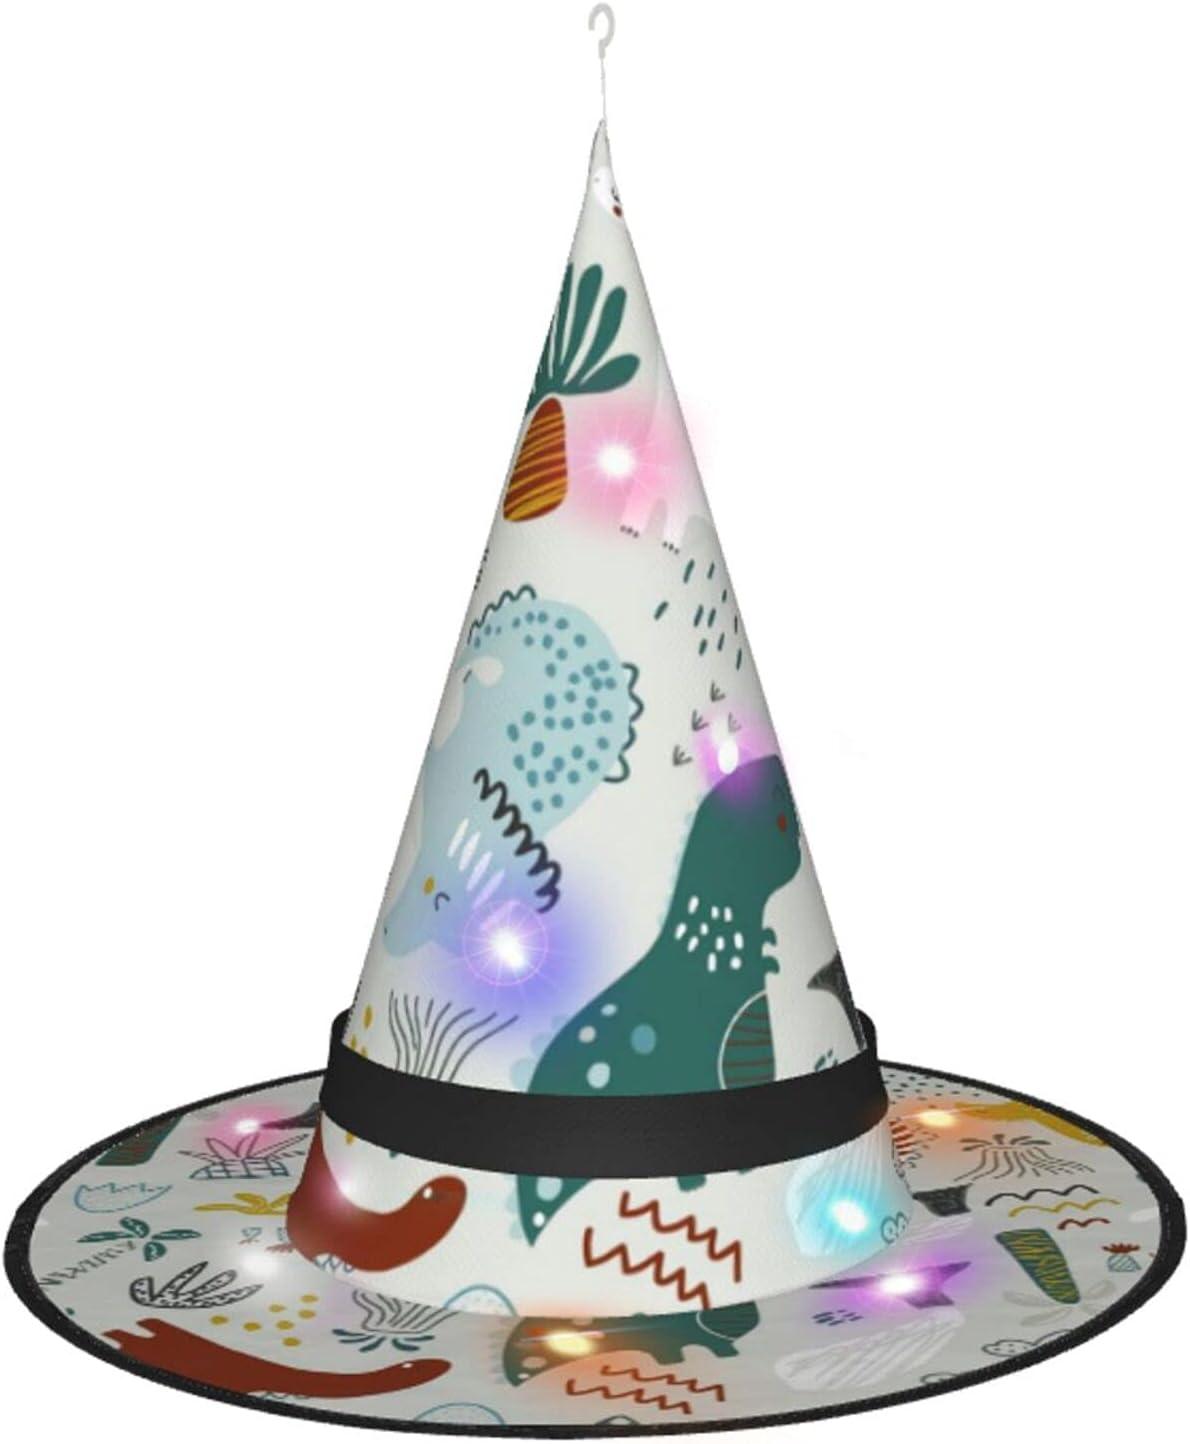 AJUNJUNPAI Seattle Mall Childish gift Cute Dinosaur Glowing Colourfu Hat Halloween